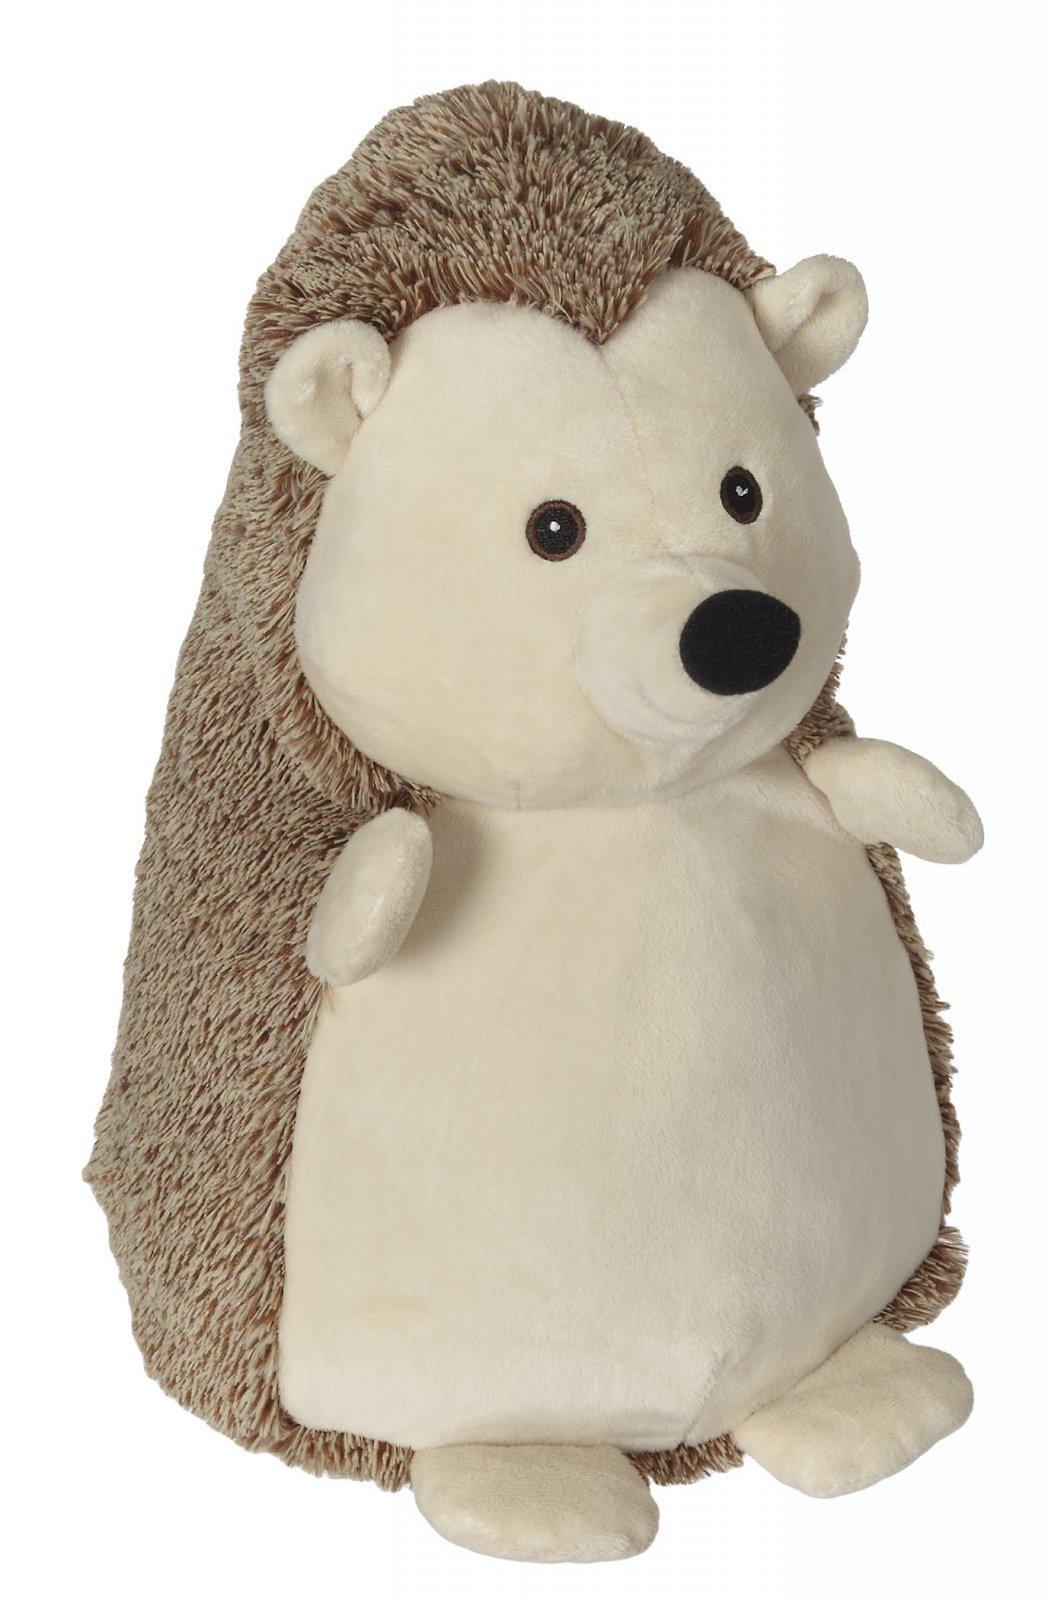 Hedley Hedgehog